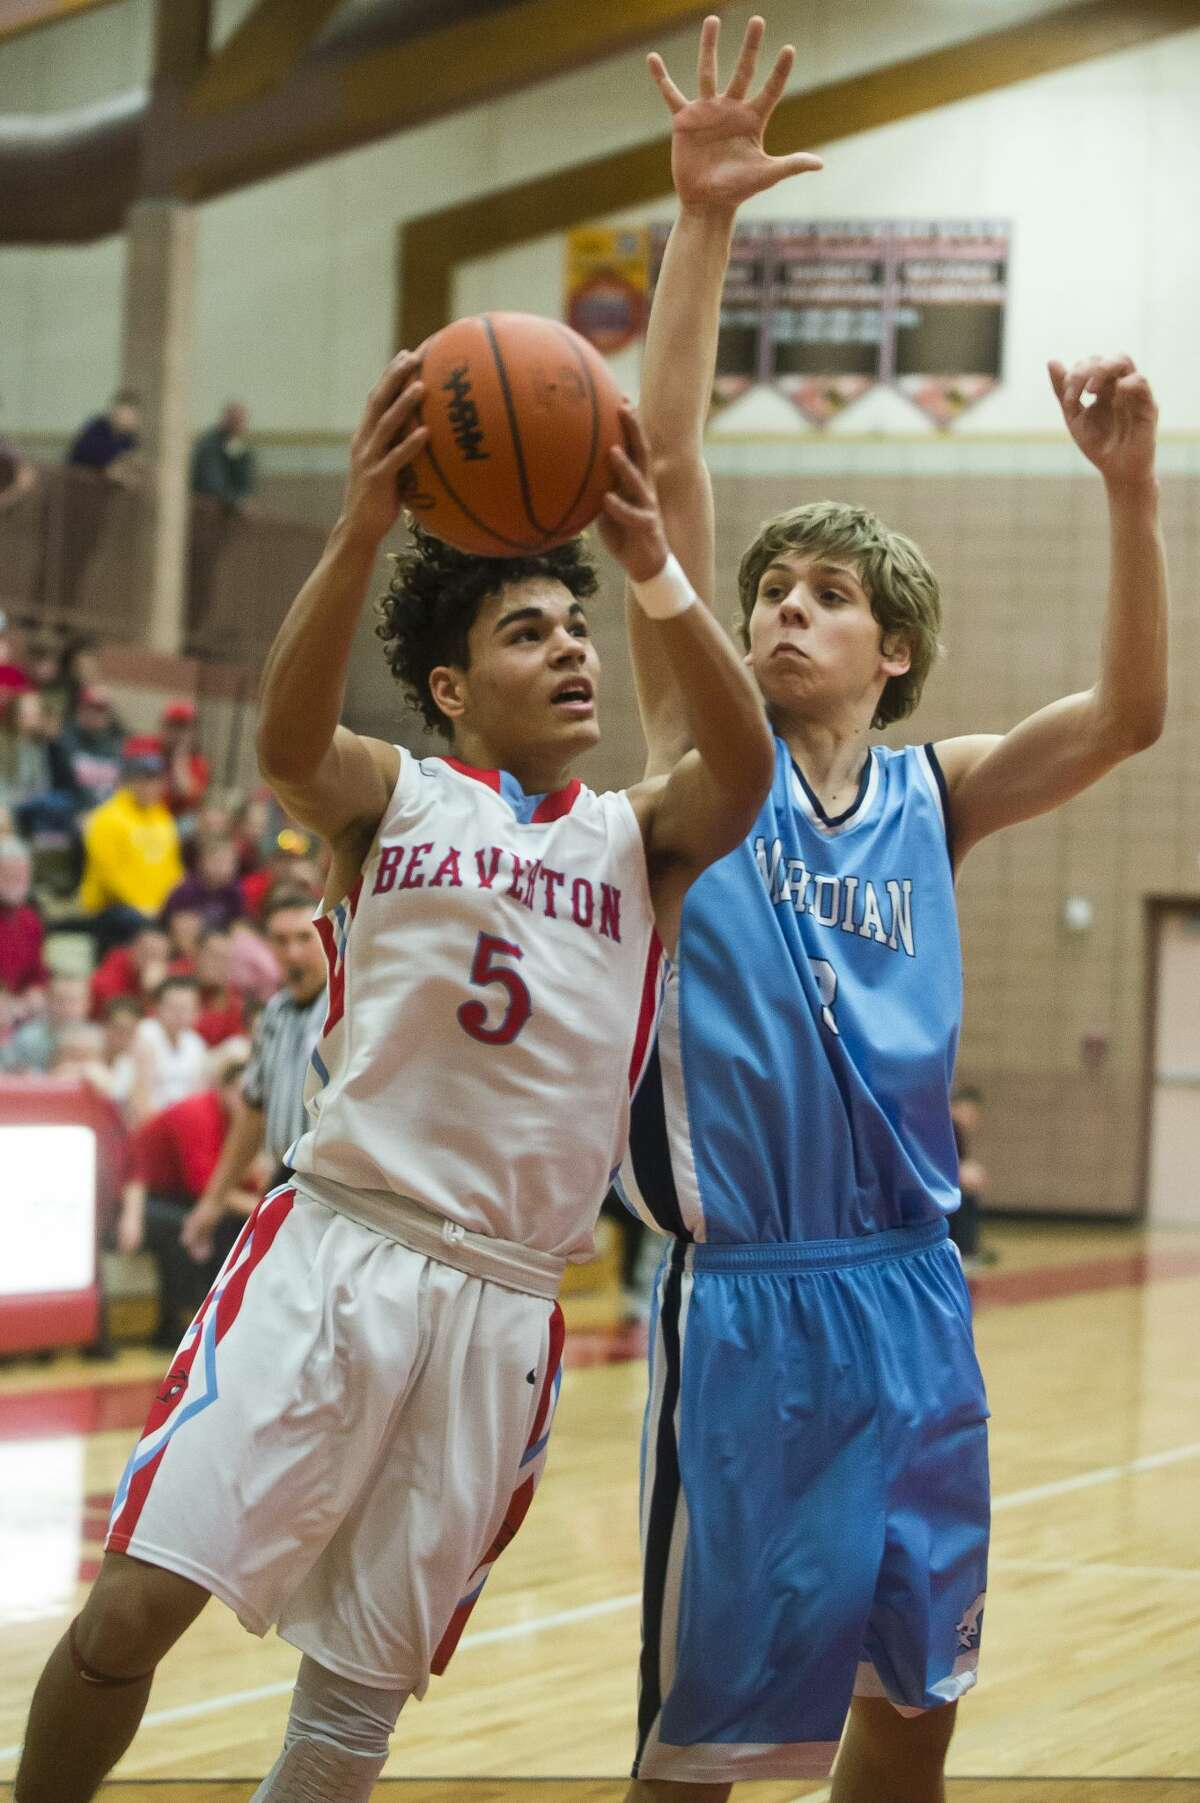 Beaverton senior Nate Taylor takes a shot as Meridian junior Lucas Lueder guards him during their game on Thursday, Jan. 4, 2018 at Beaverton High School. (Katy Kildee/kkildee@mdn.net)